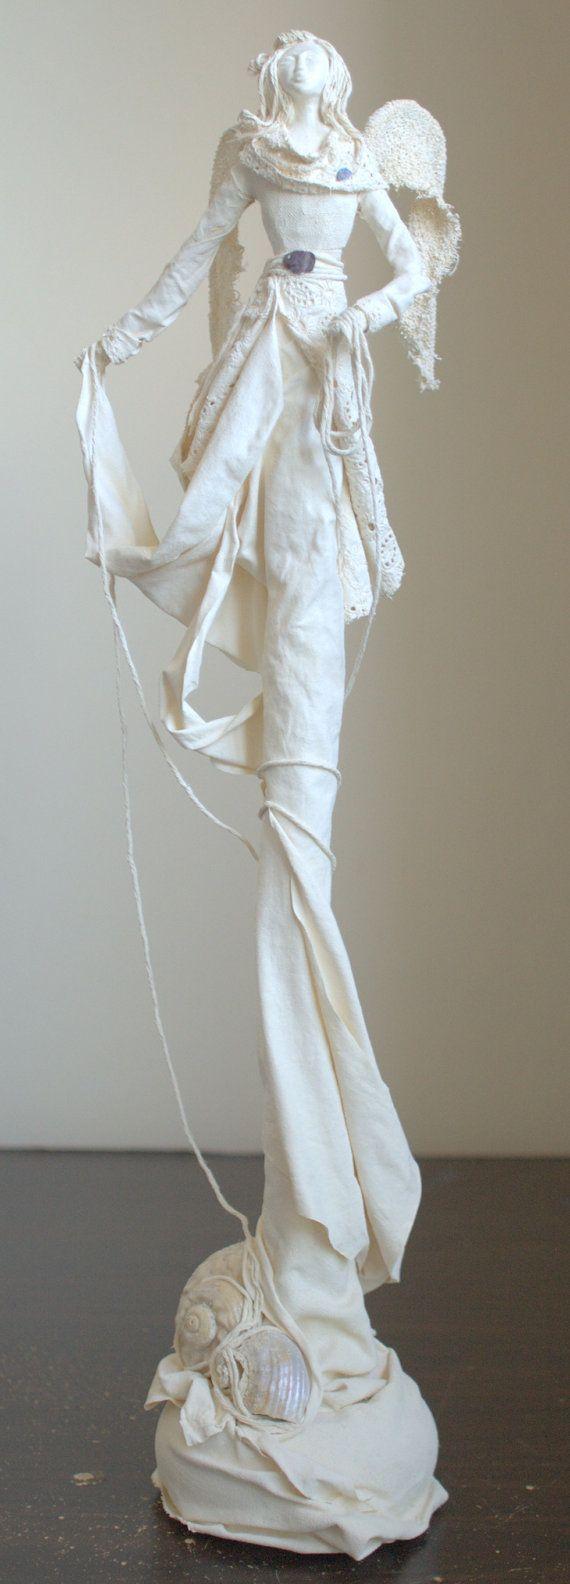 Caitlyn angel sculpture original handmade gift home by SeaMessage